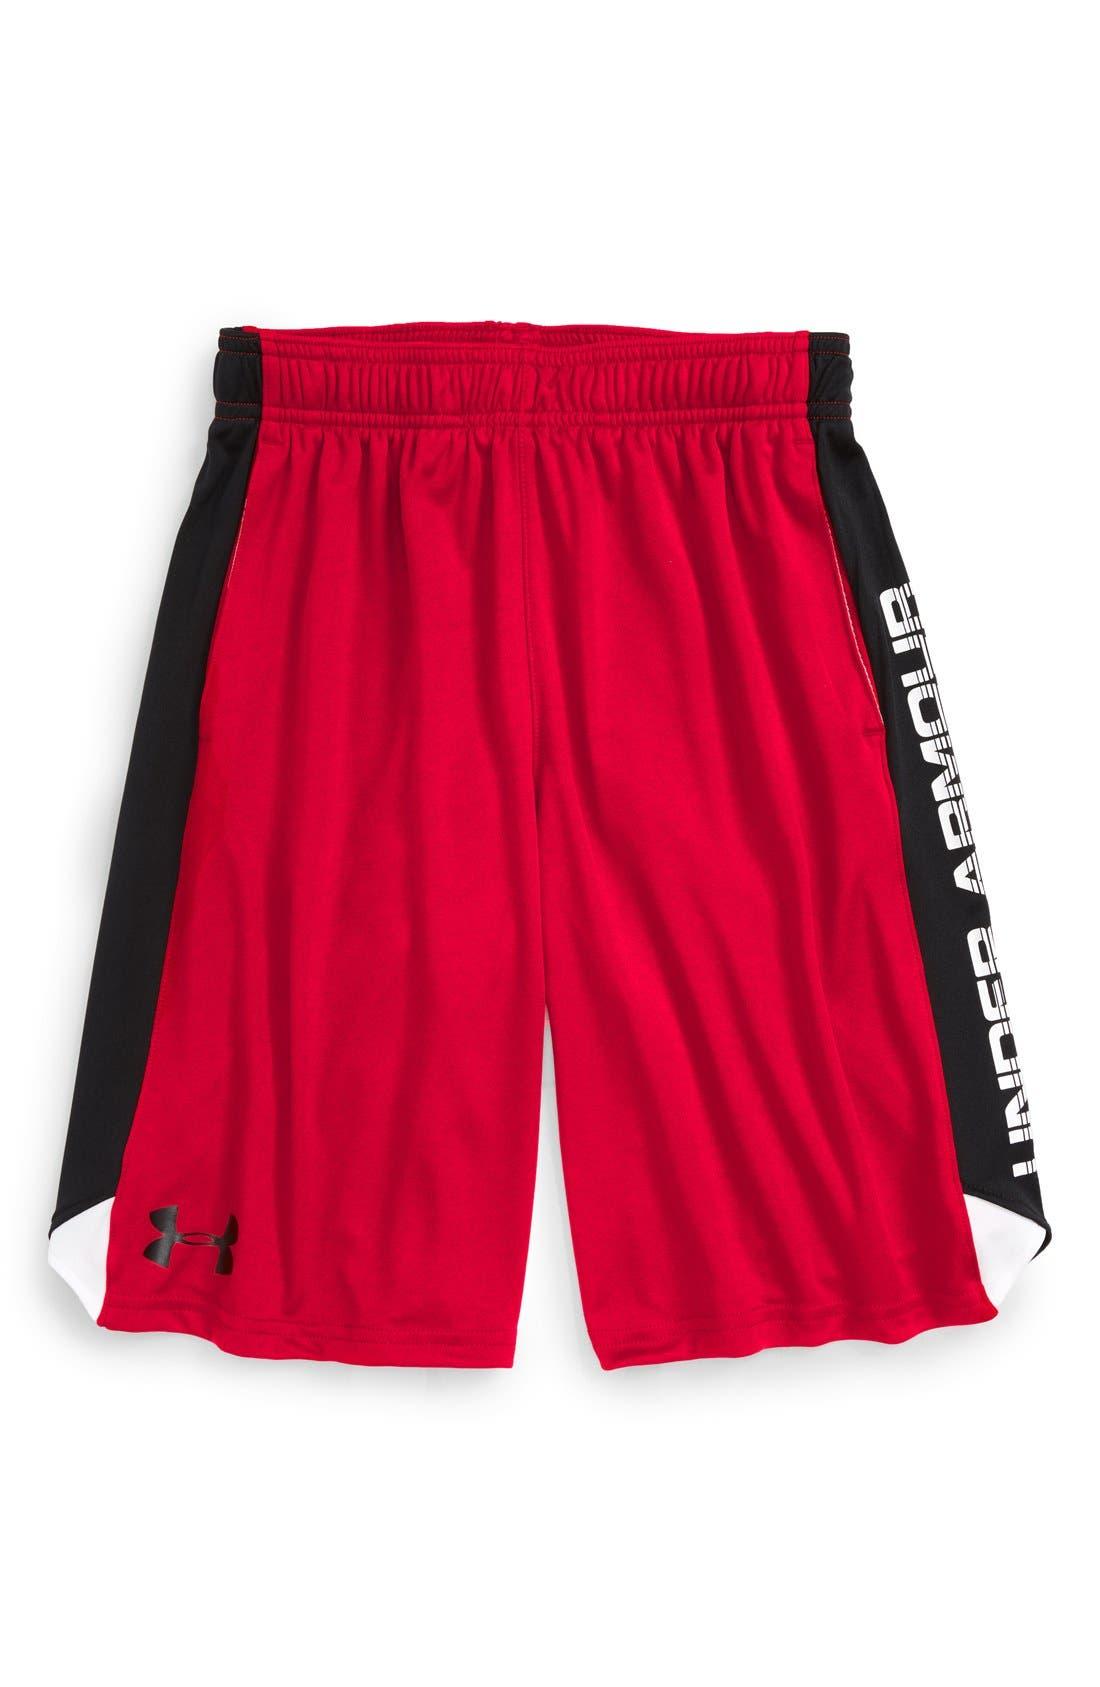 Alternate Image 1 Selected - Under Armour 'Eliminator' HeatGear® Shorts (Big Boys)